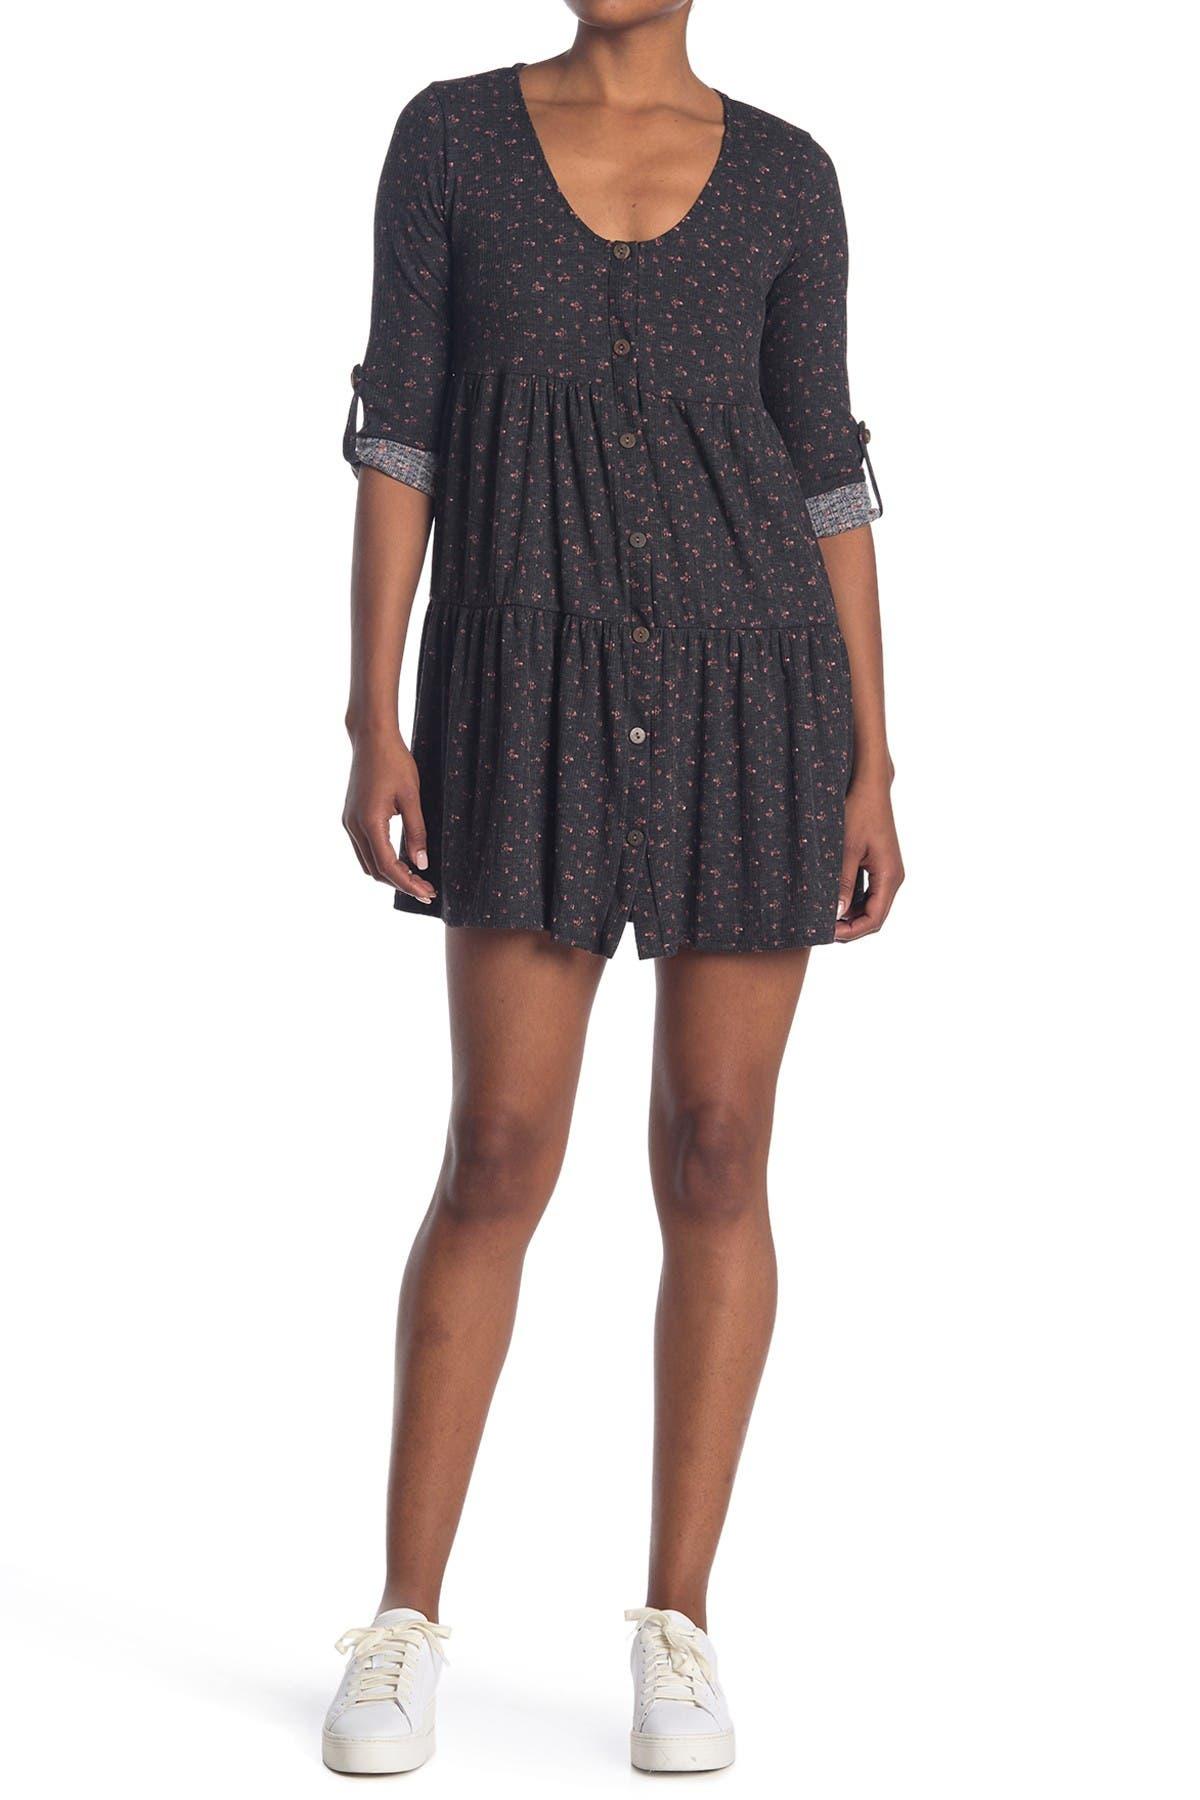 Image of KENEDIK Ditsy Floral Tiered Rib Knit Dress